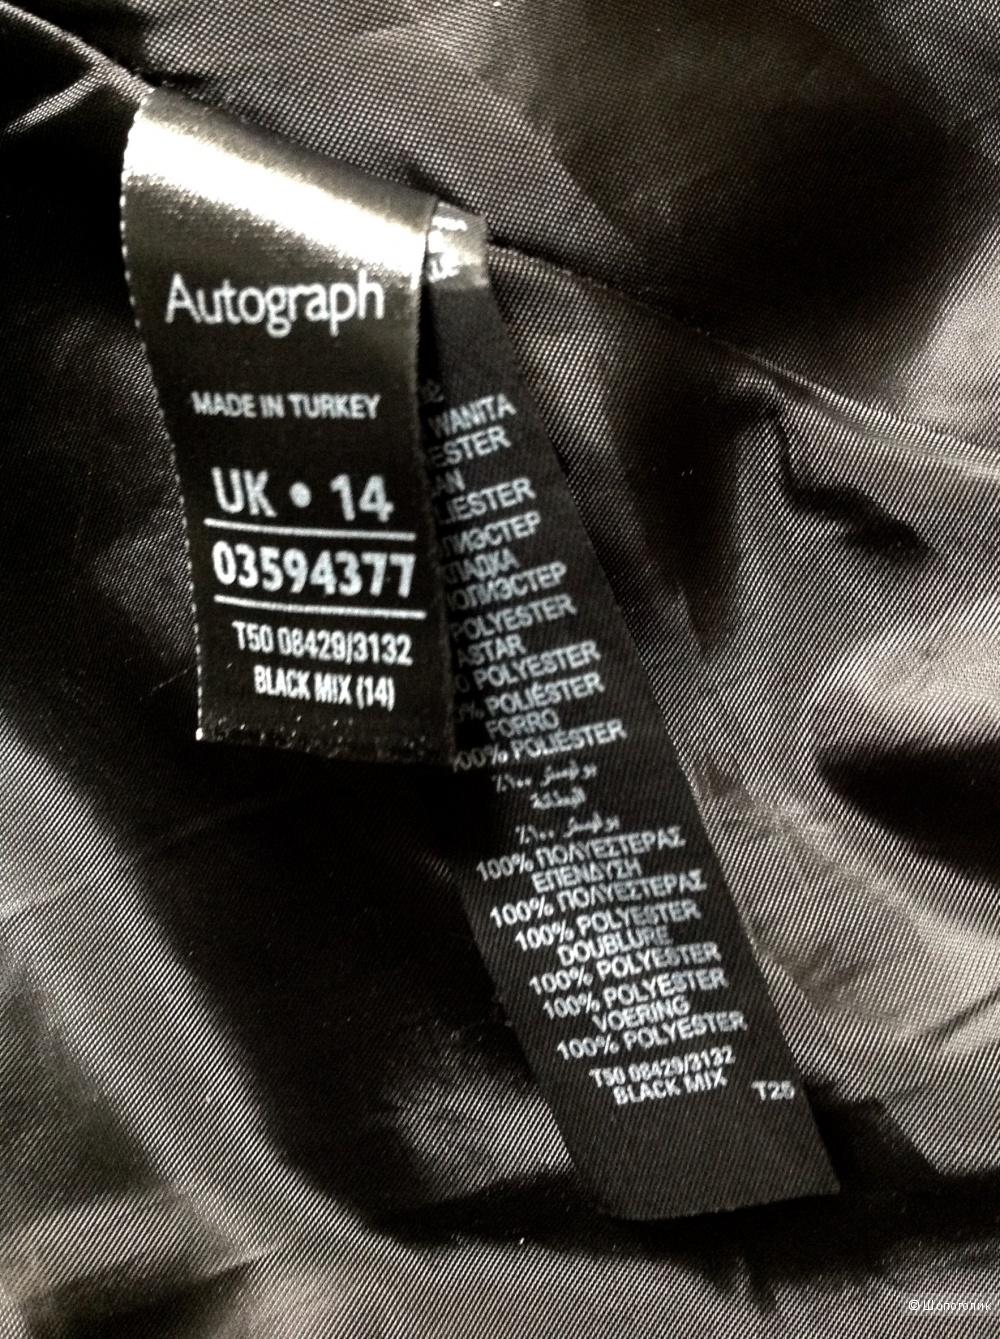 Платье M&S Autograph, размер 14 на 50.